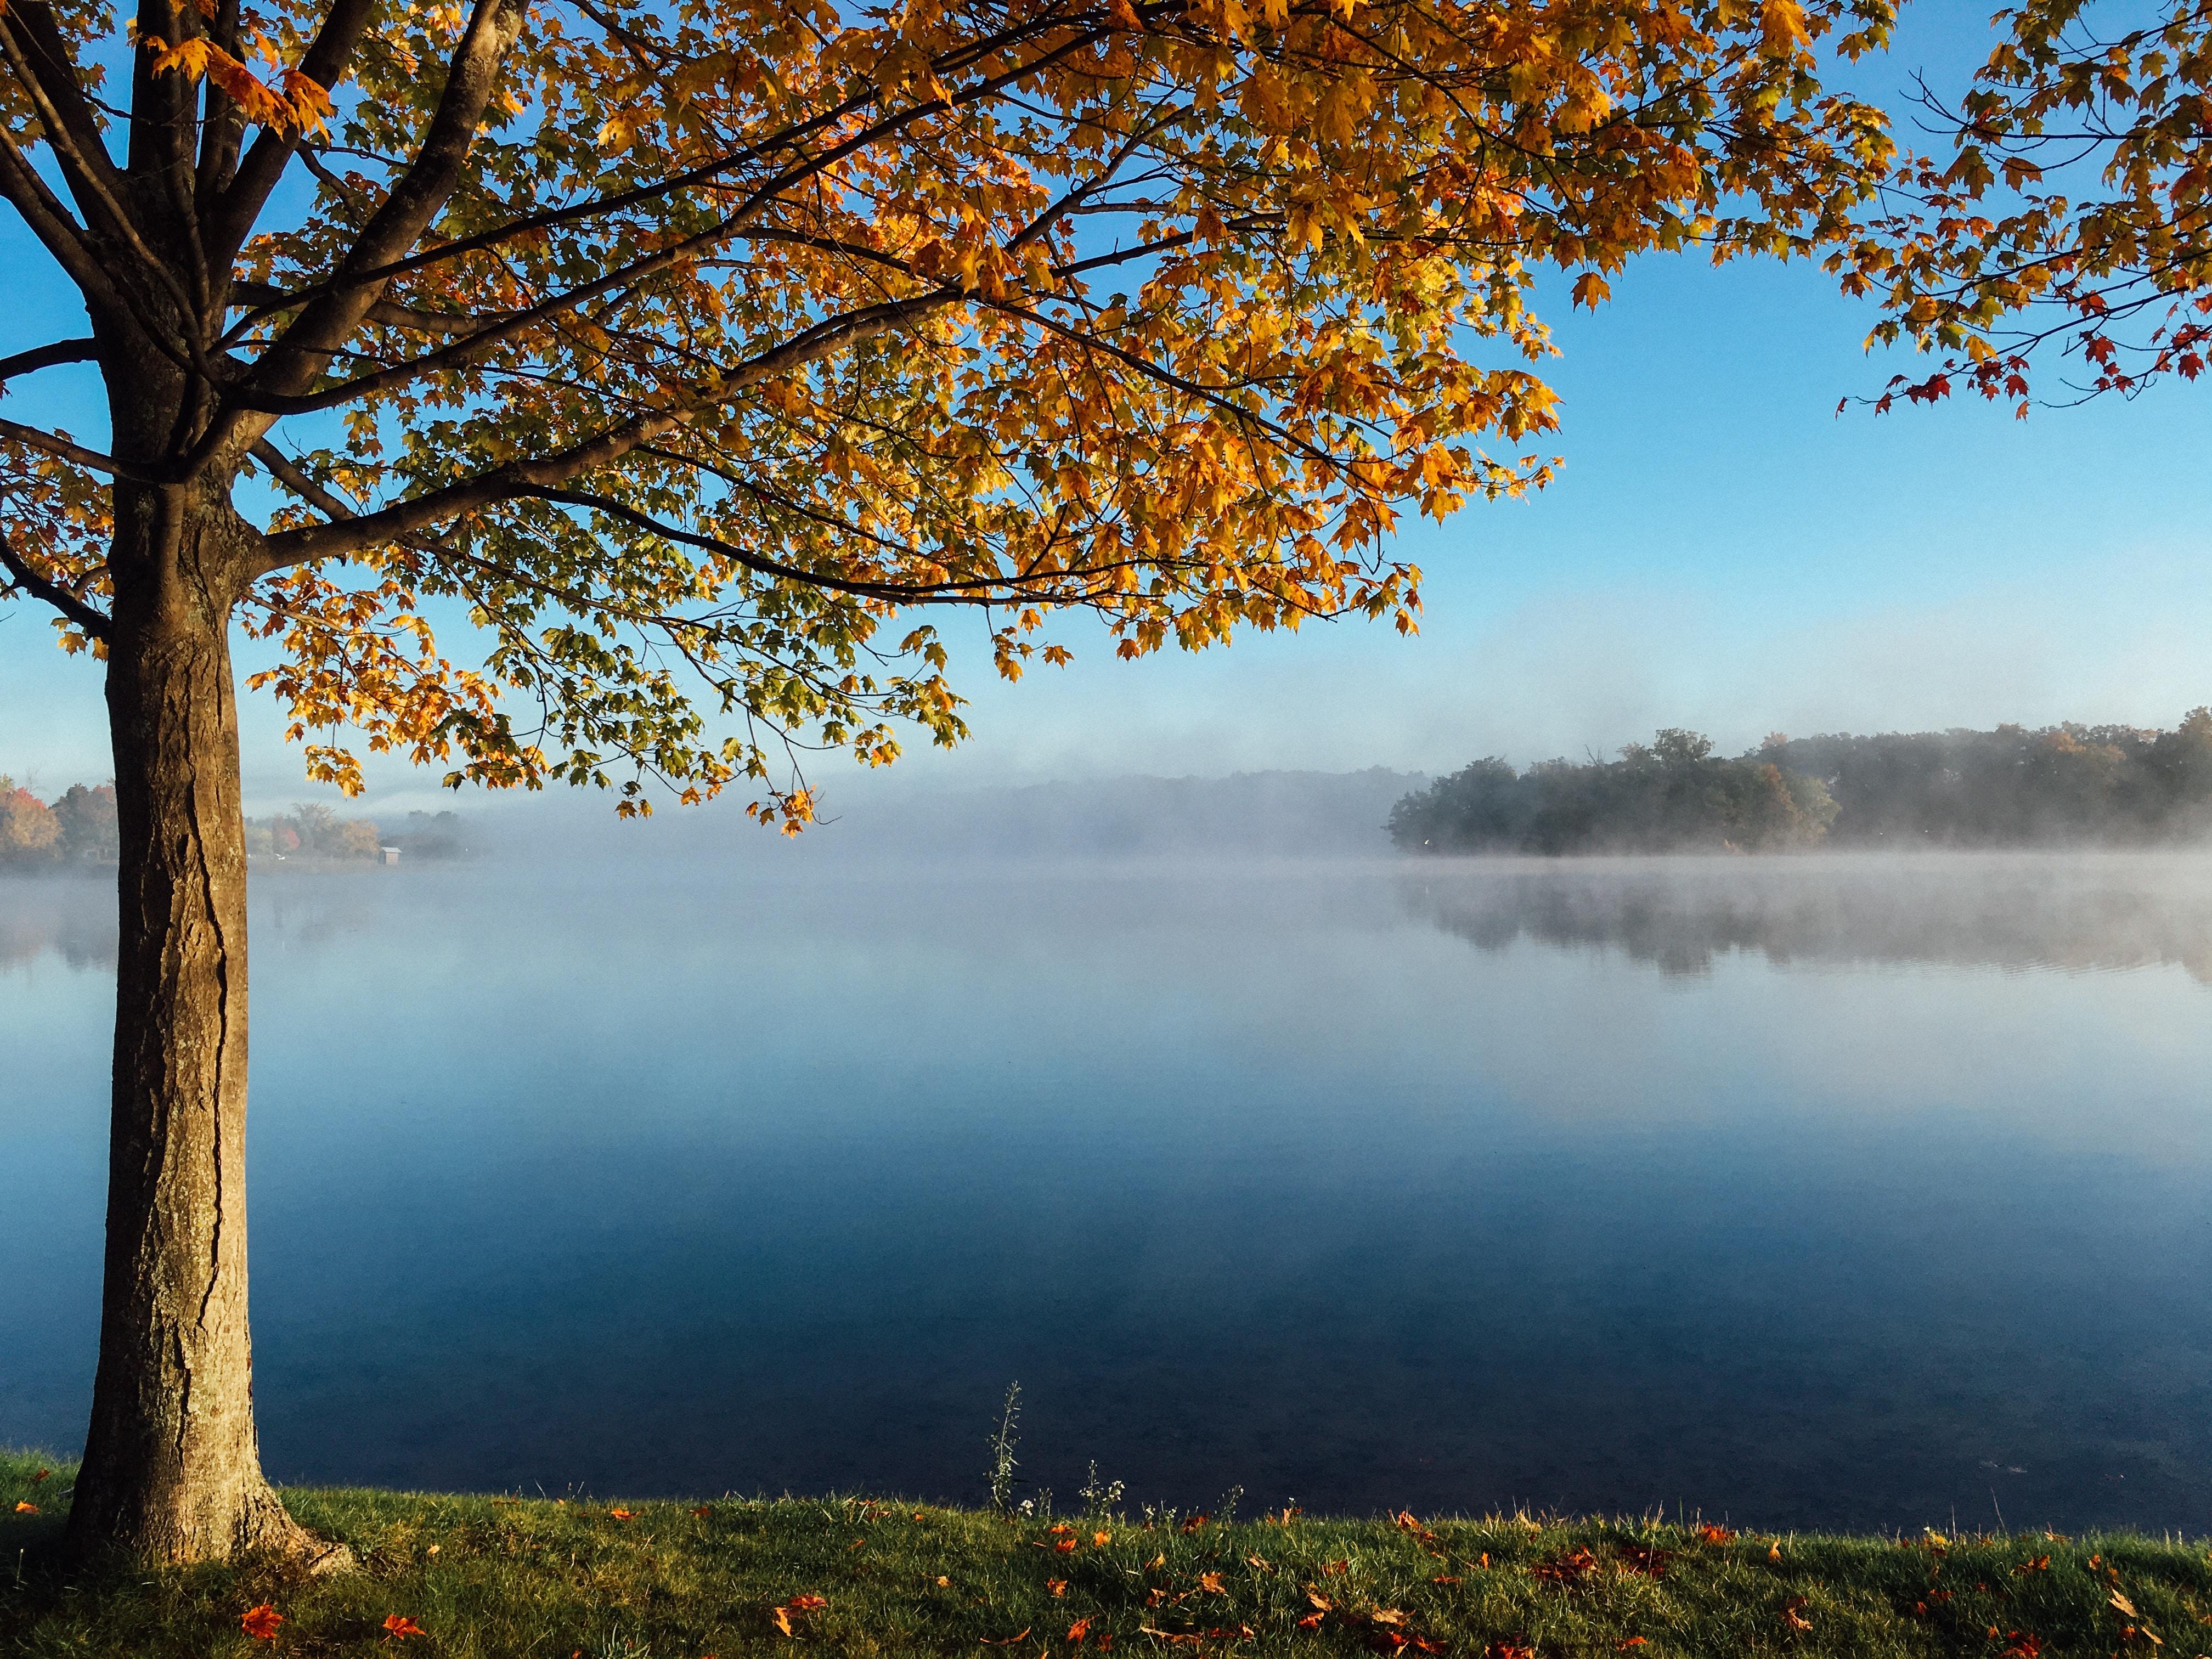 brown leaf tree facing the lake